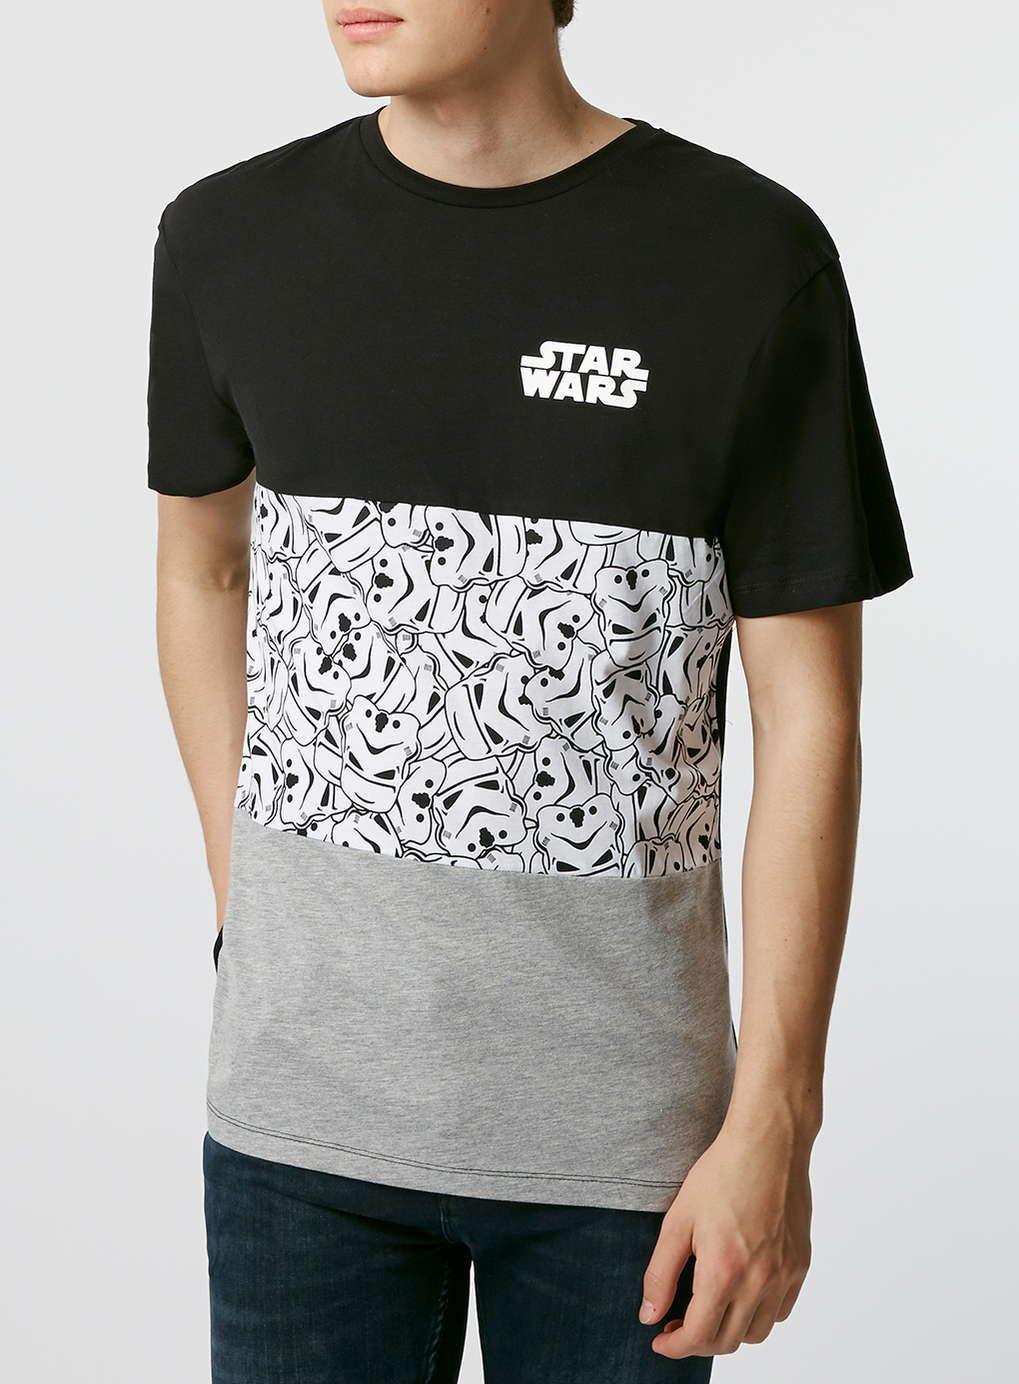 Black t shirt topman - Photo 1 Of Black Star Wars T Shirt